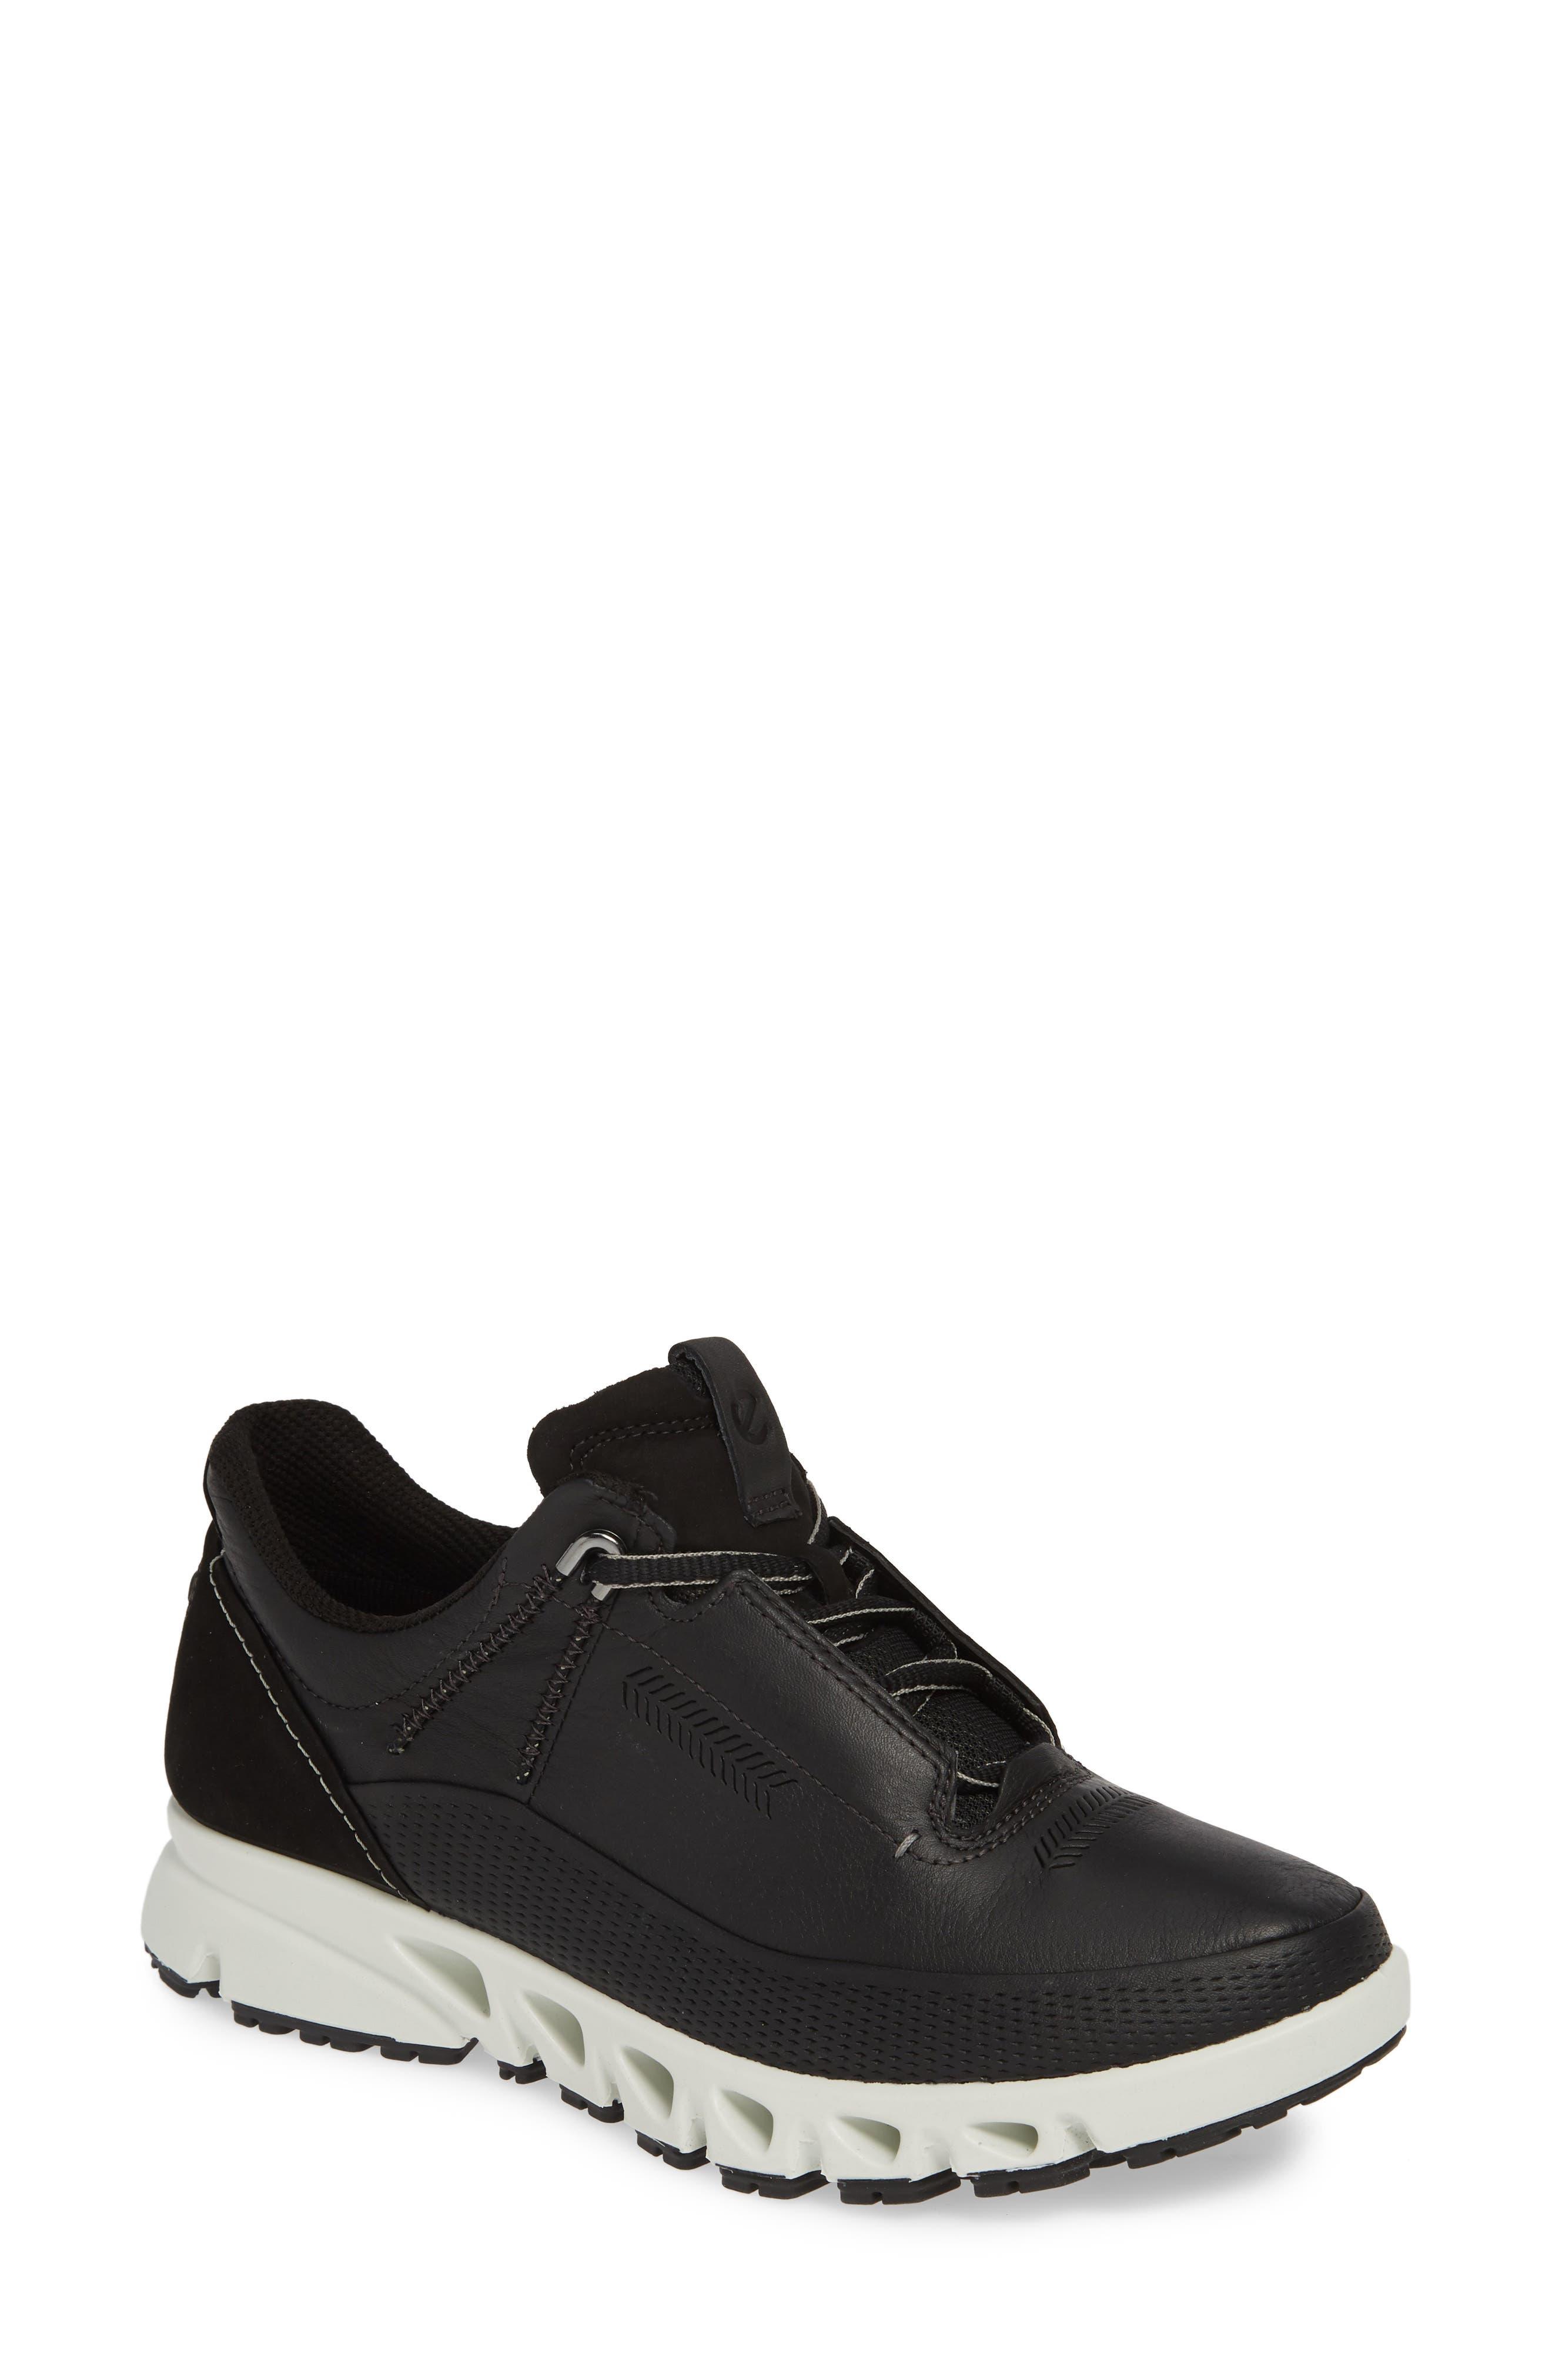 Ecco Omni-Vent Gore-Tex Waterproof Sneaker, Black